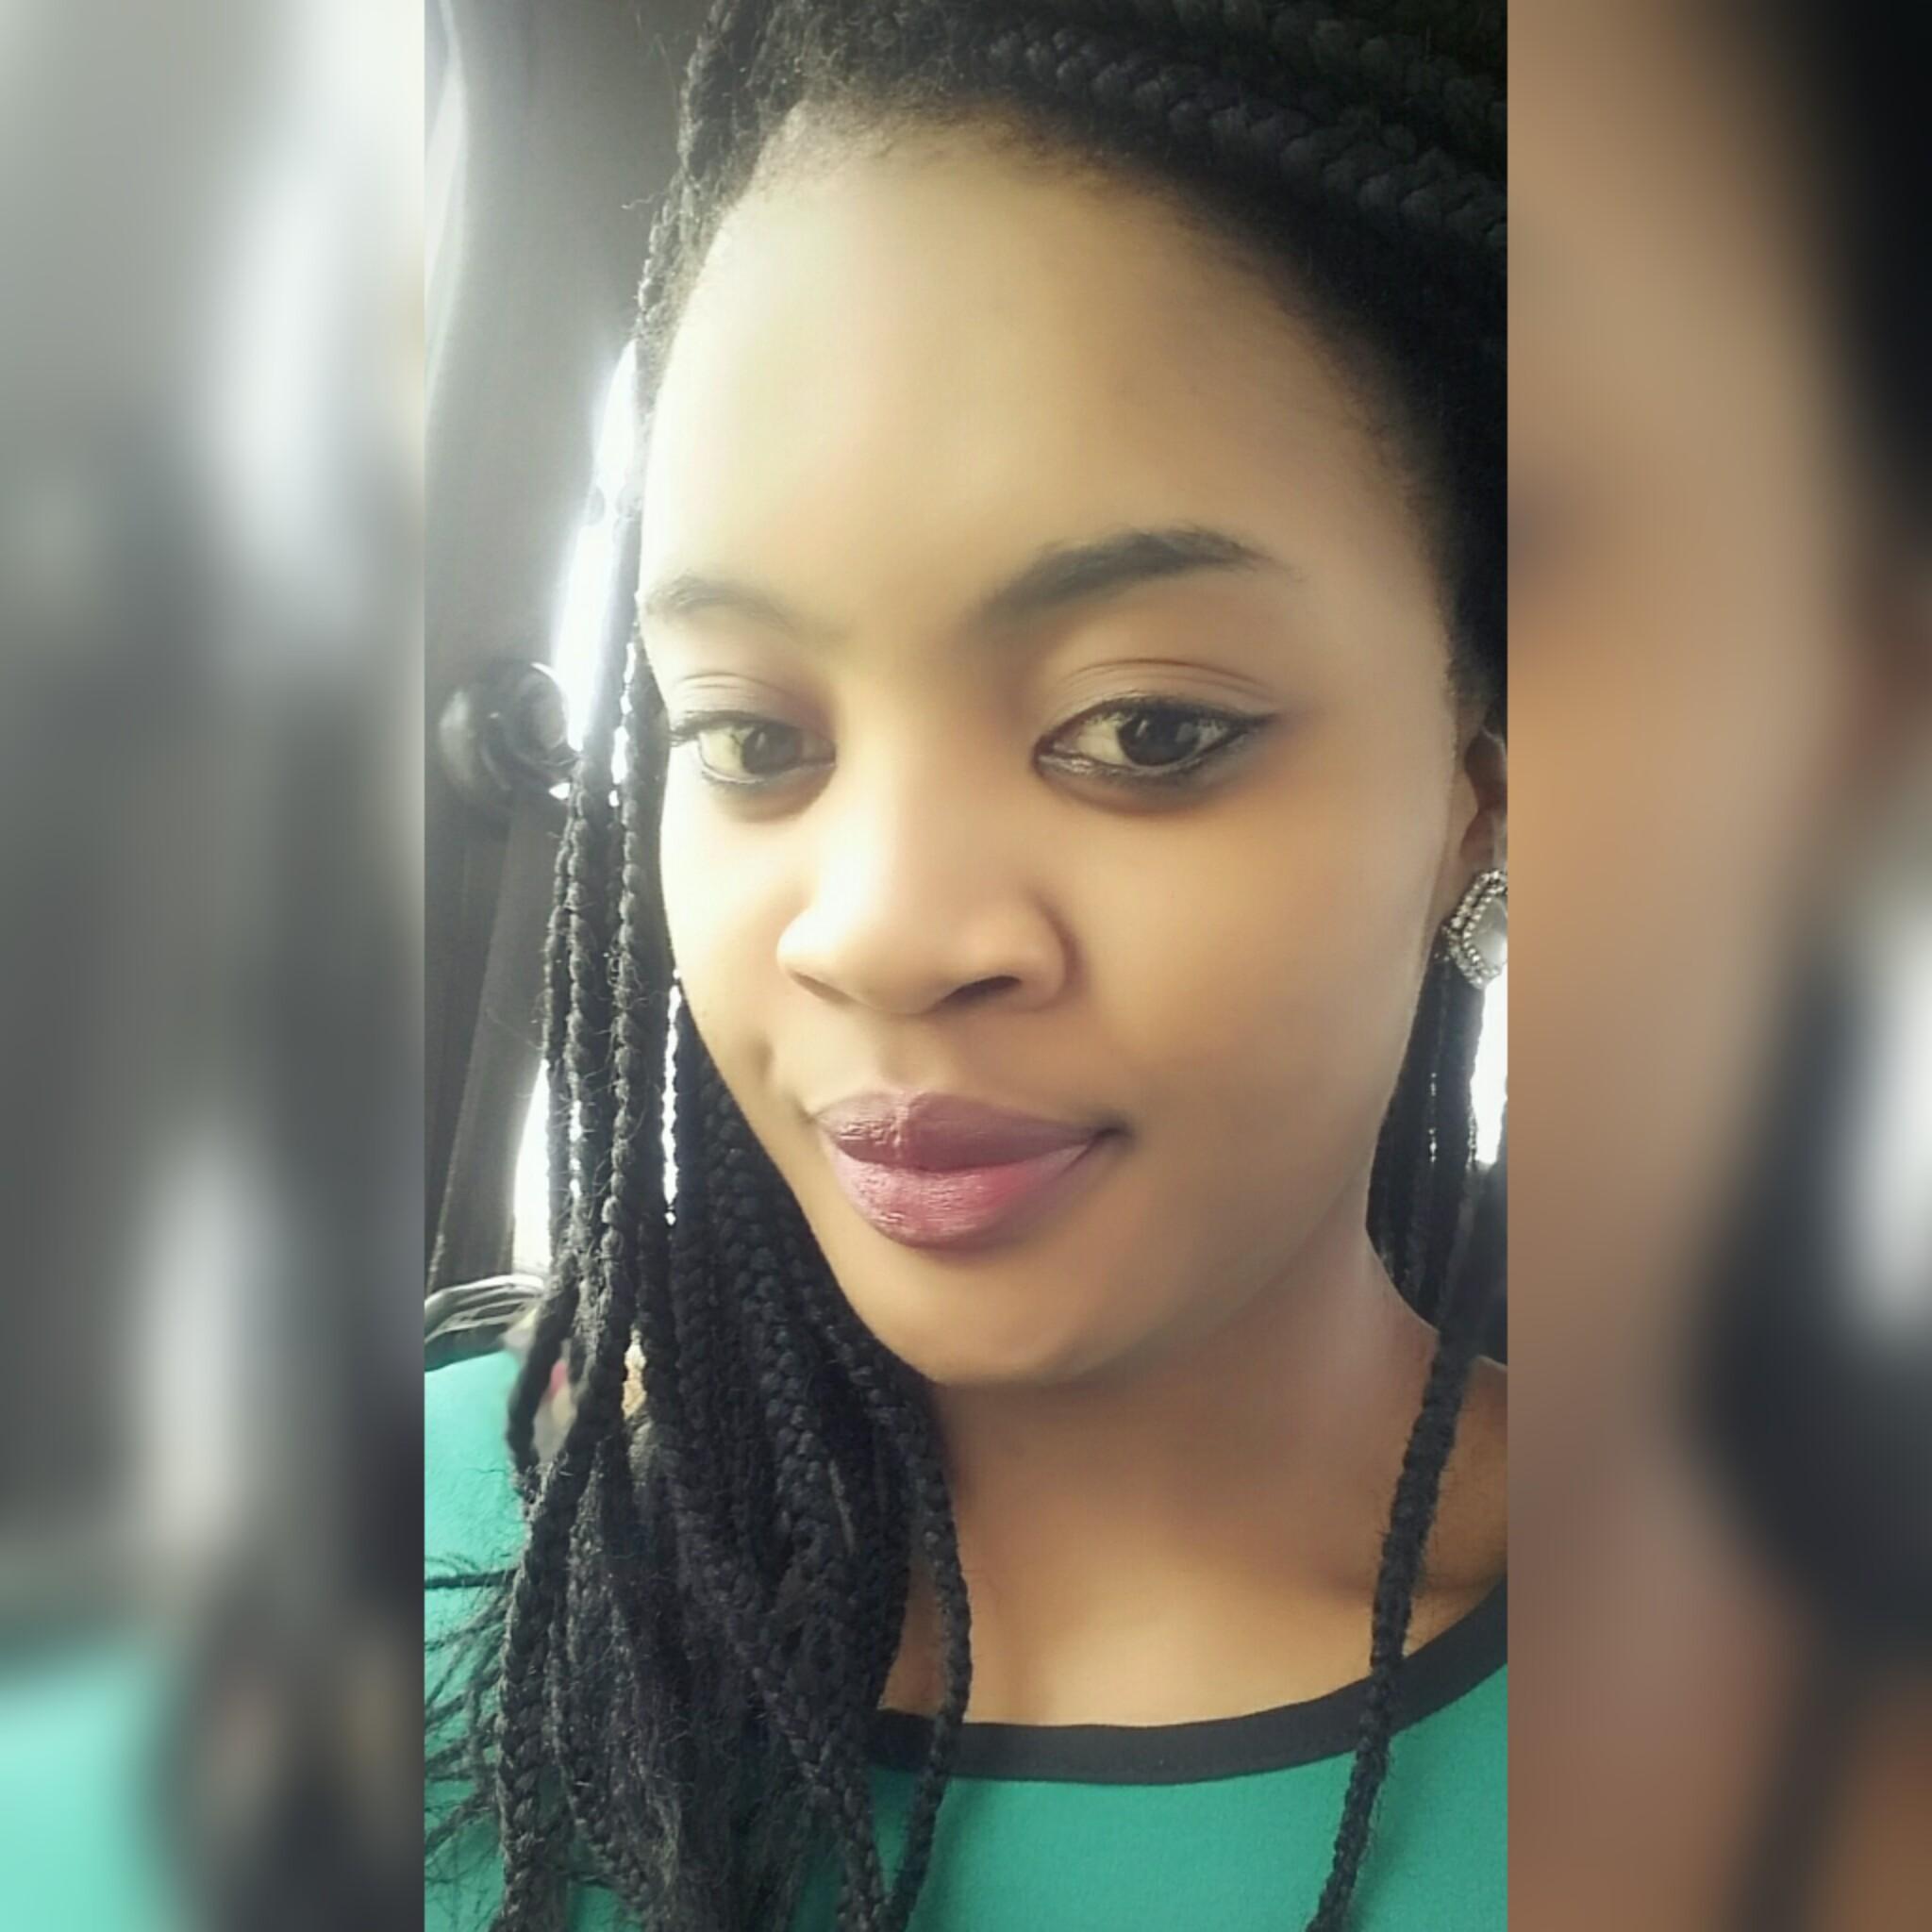 Nomusa Mercy Yende. avatar picture